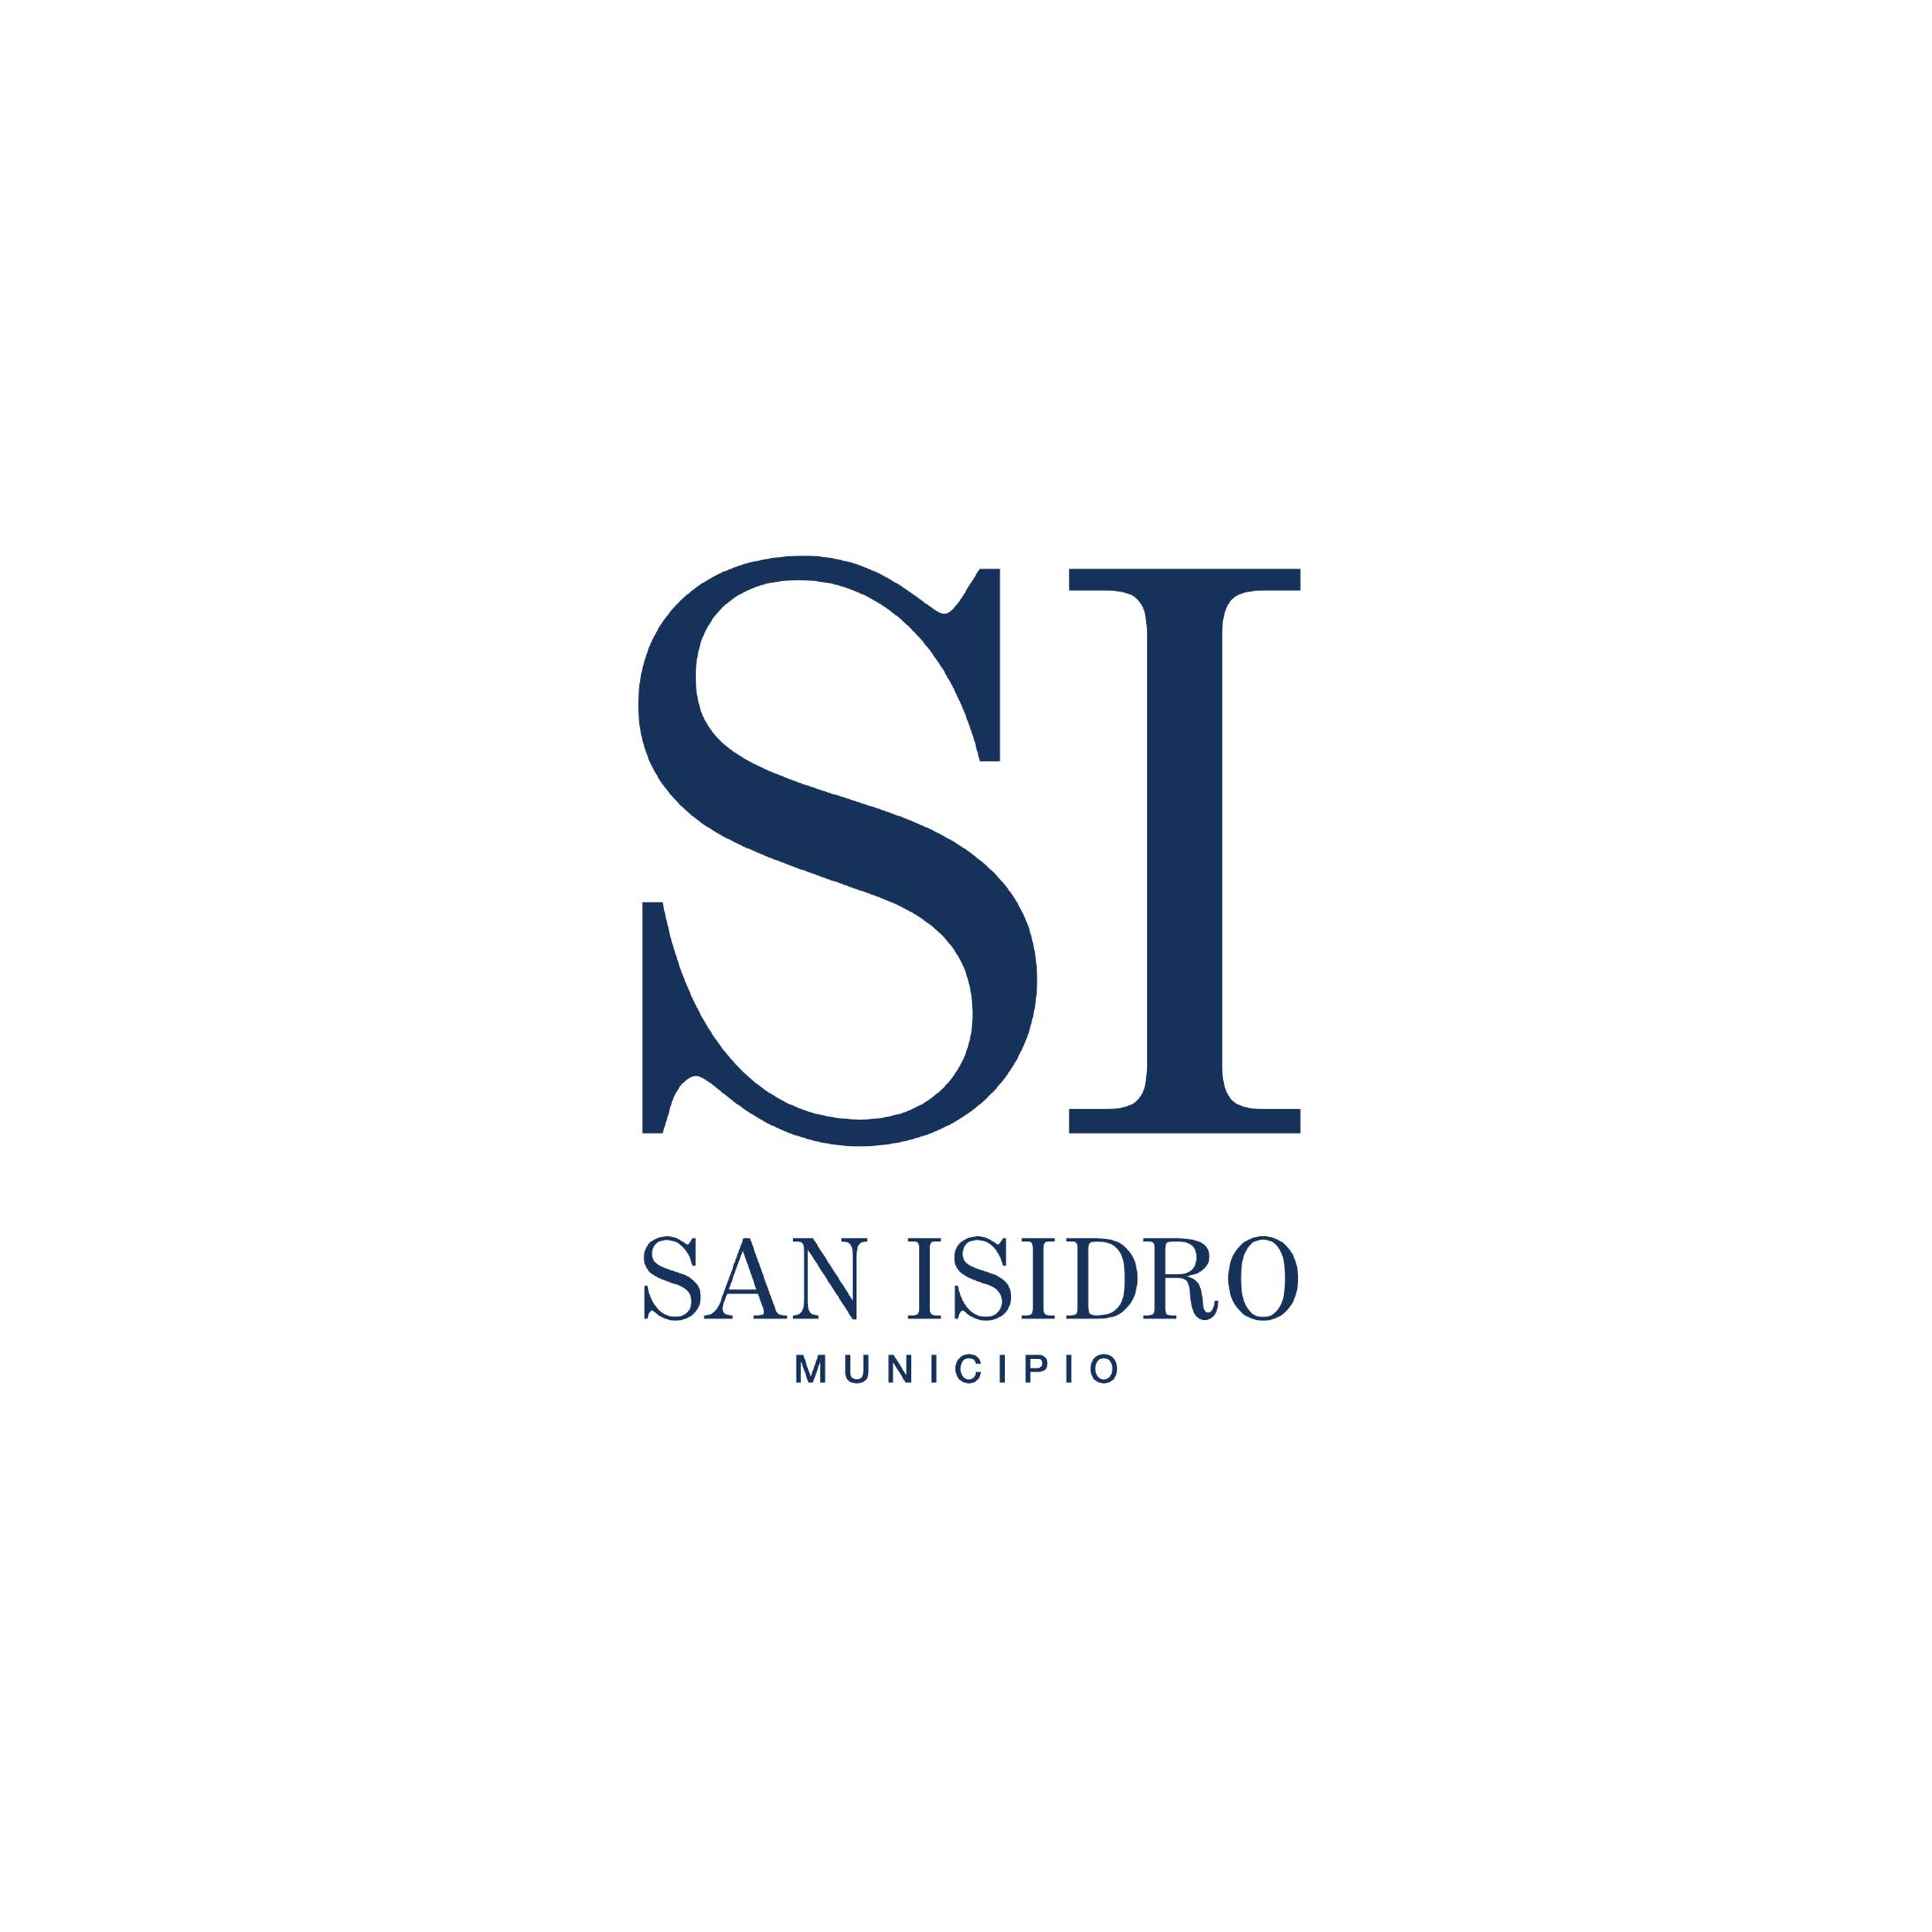 Municipio de San Isidro